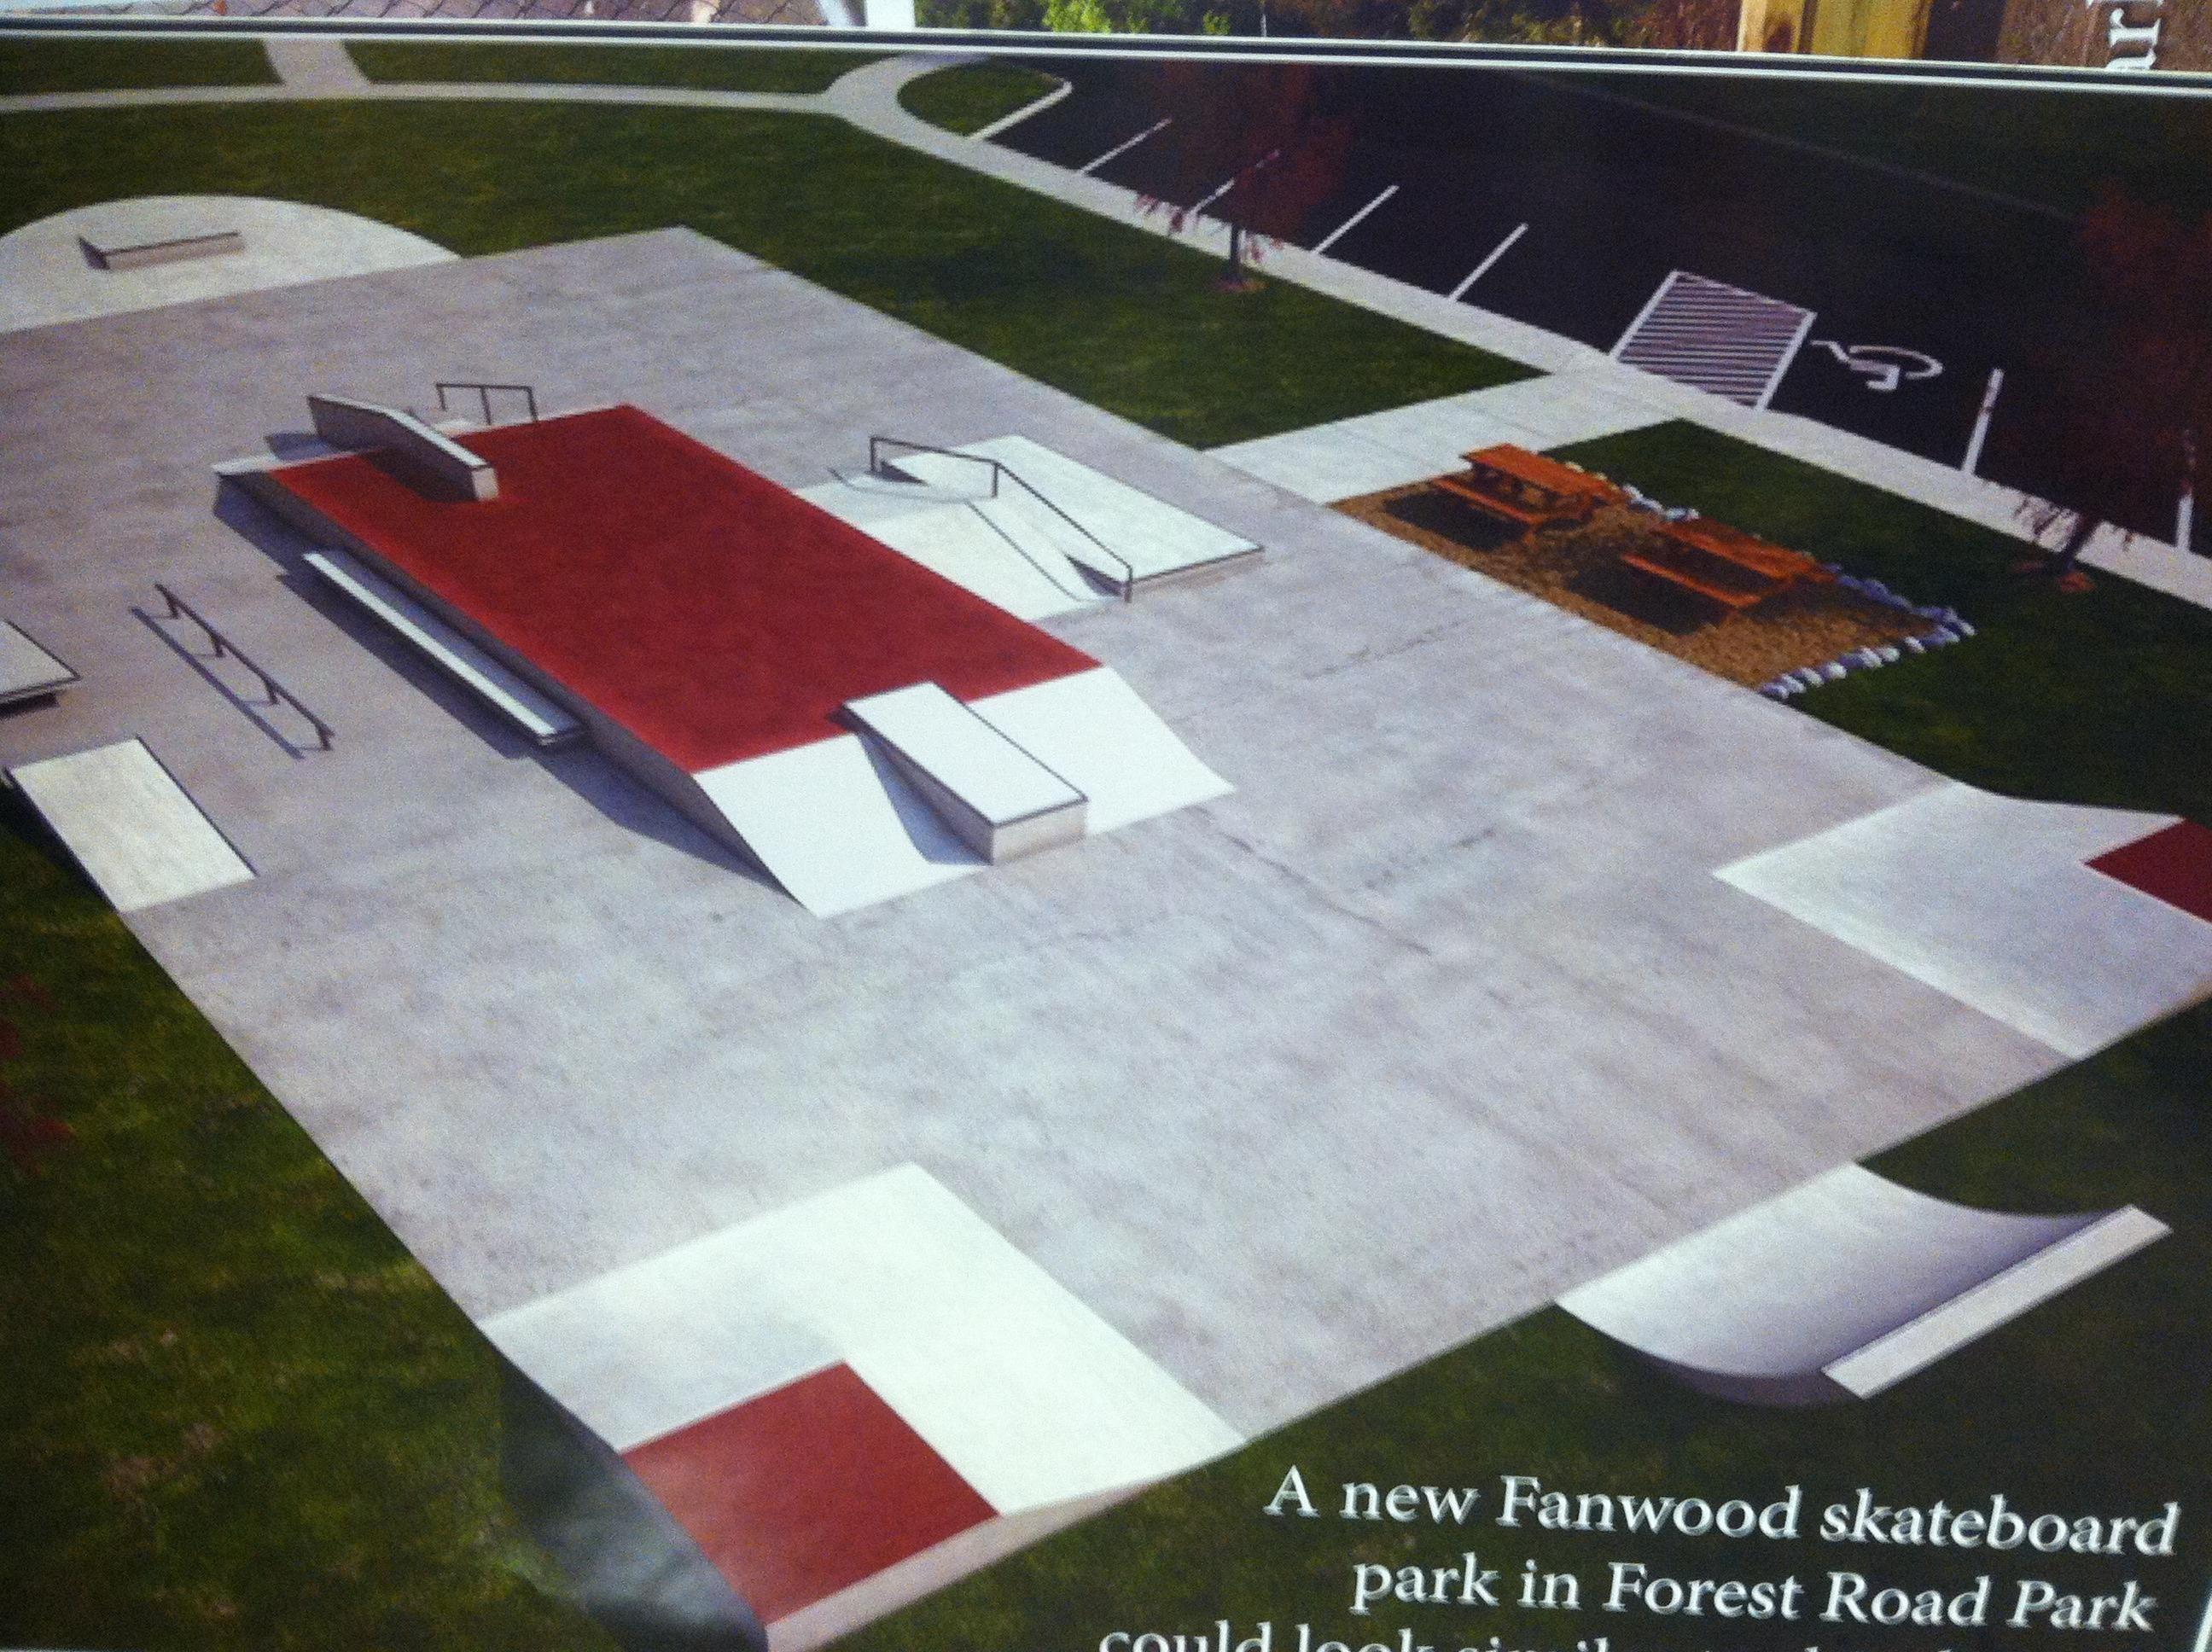 fffbc7ce62e79b3b38db_proposted_skate_park.JPG